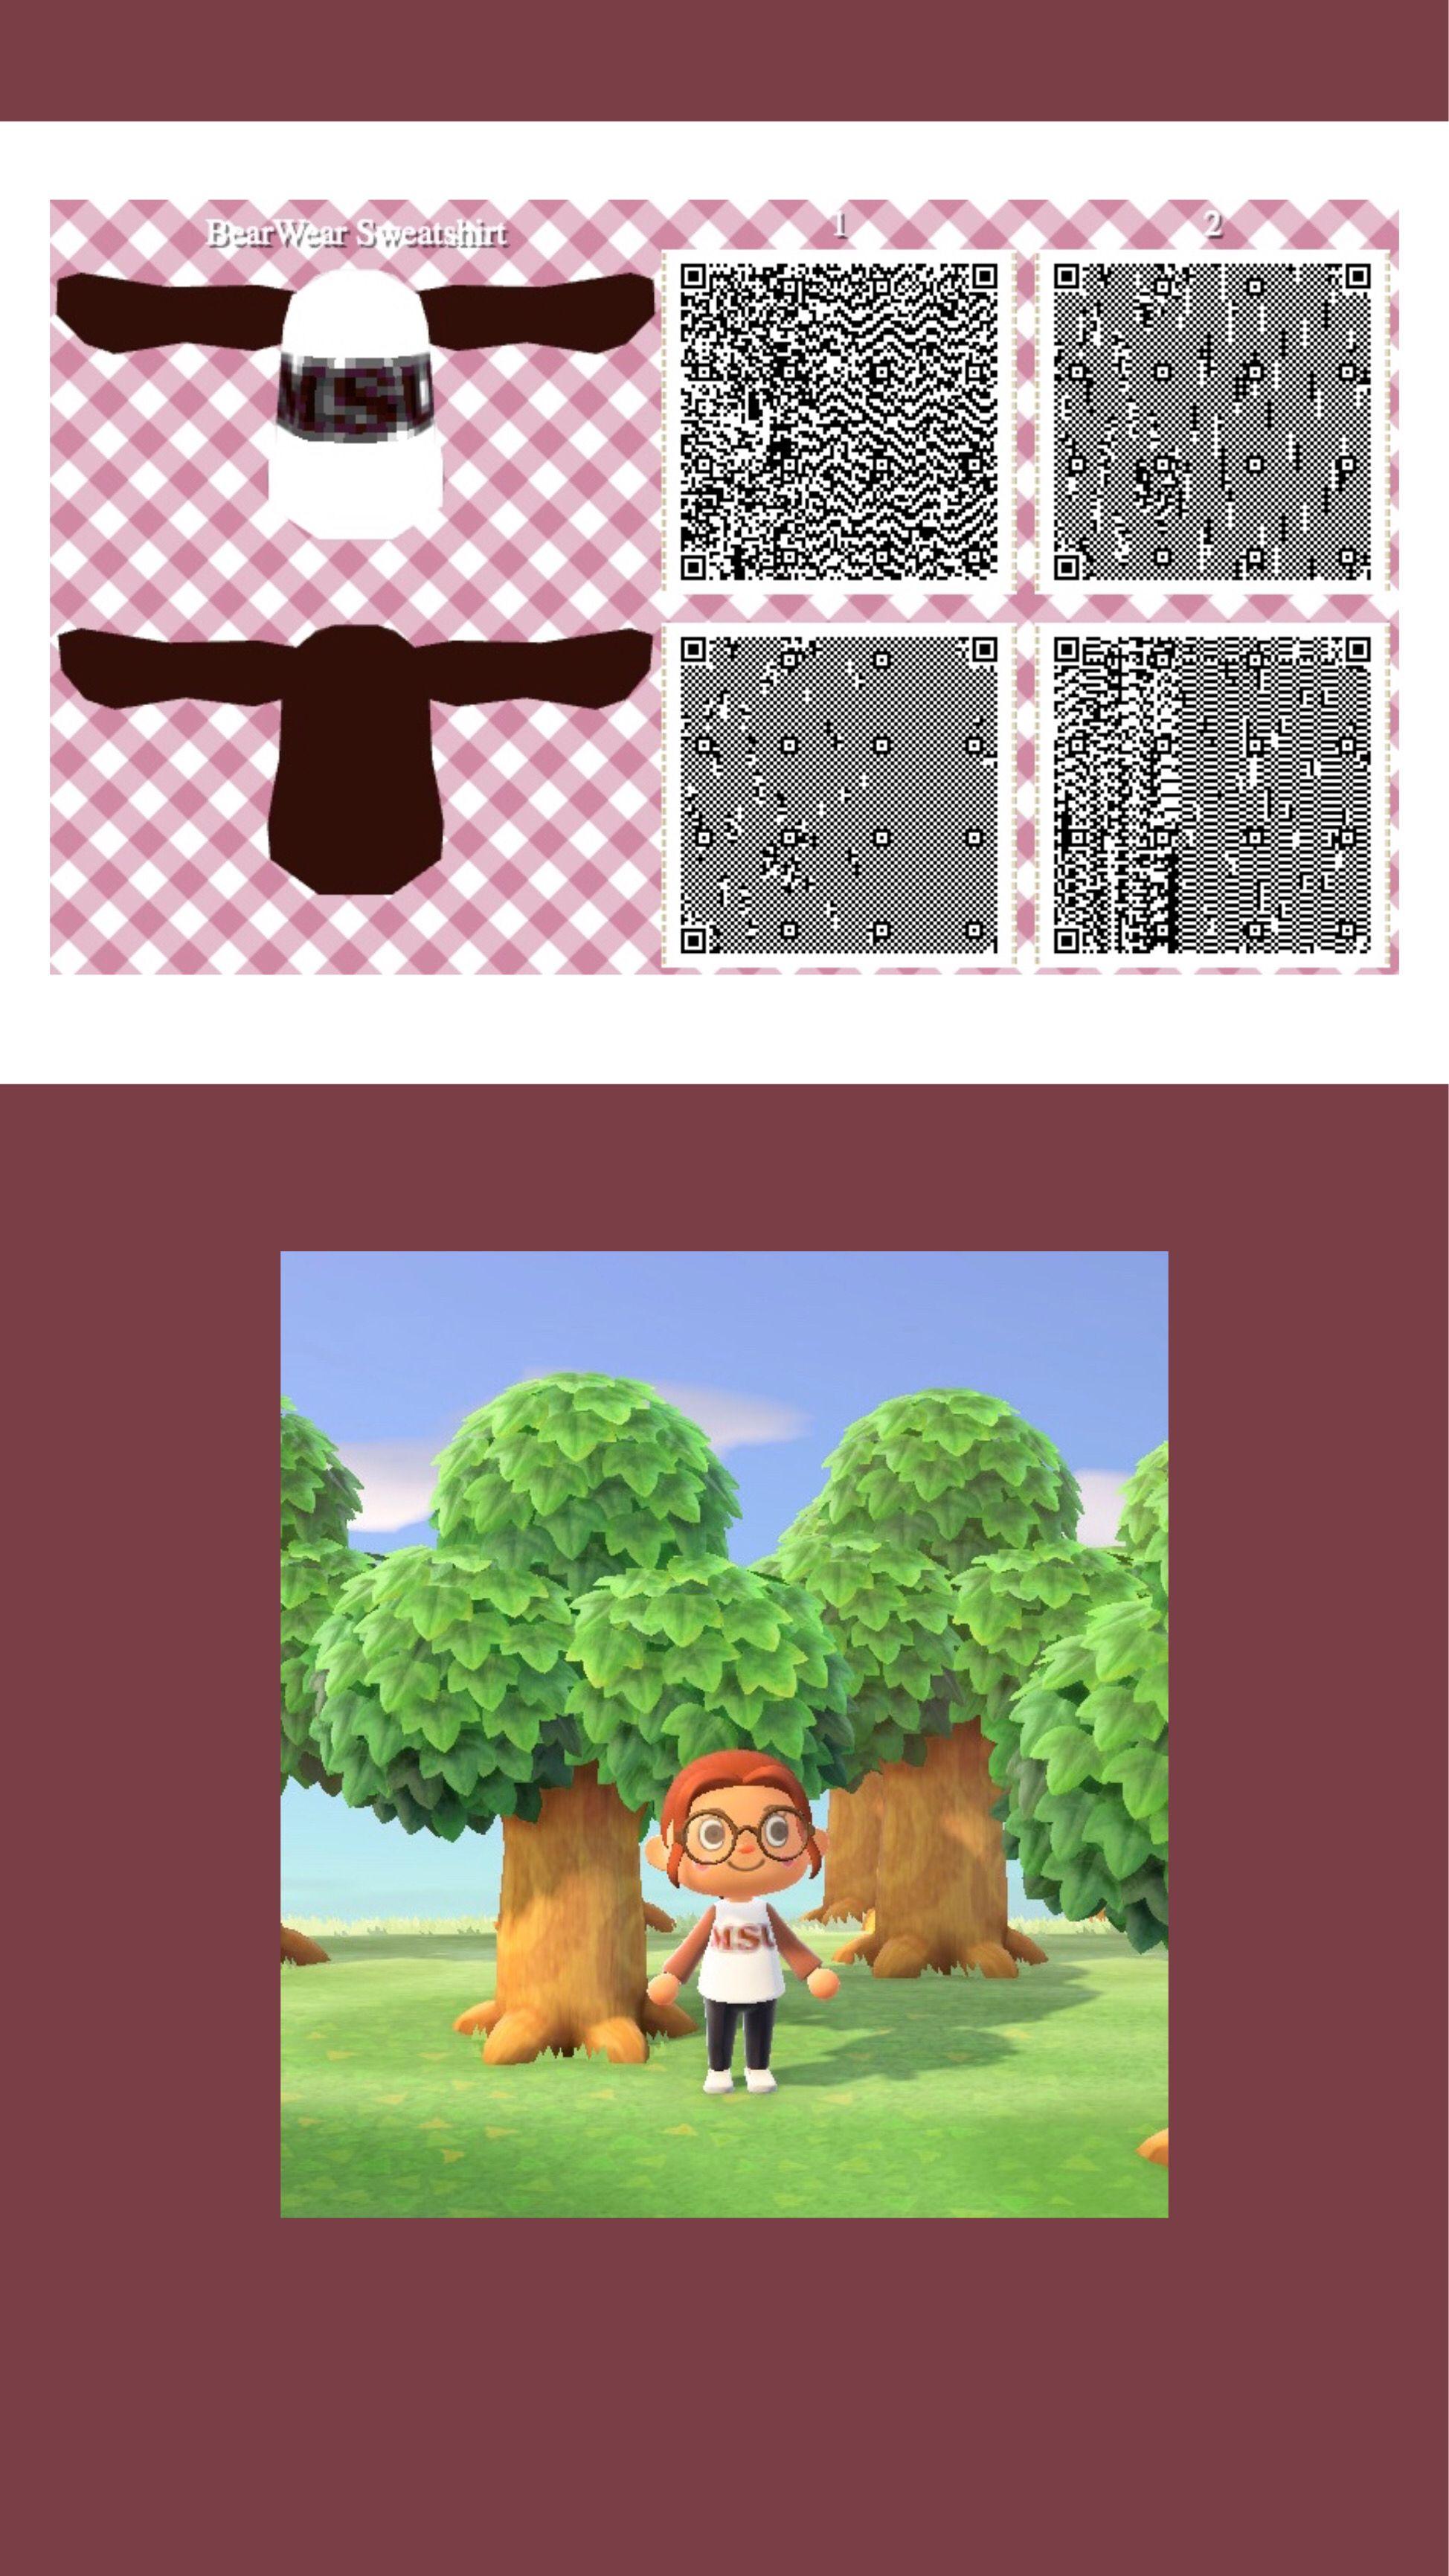 12+ Animal crossing download code ideas